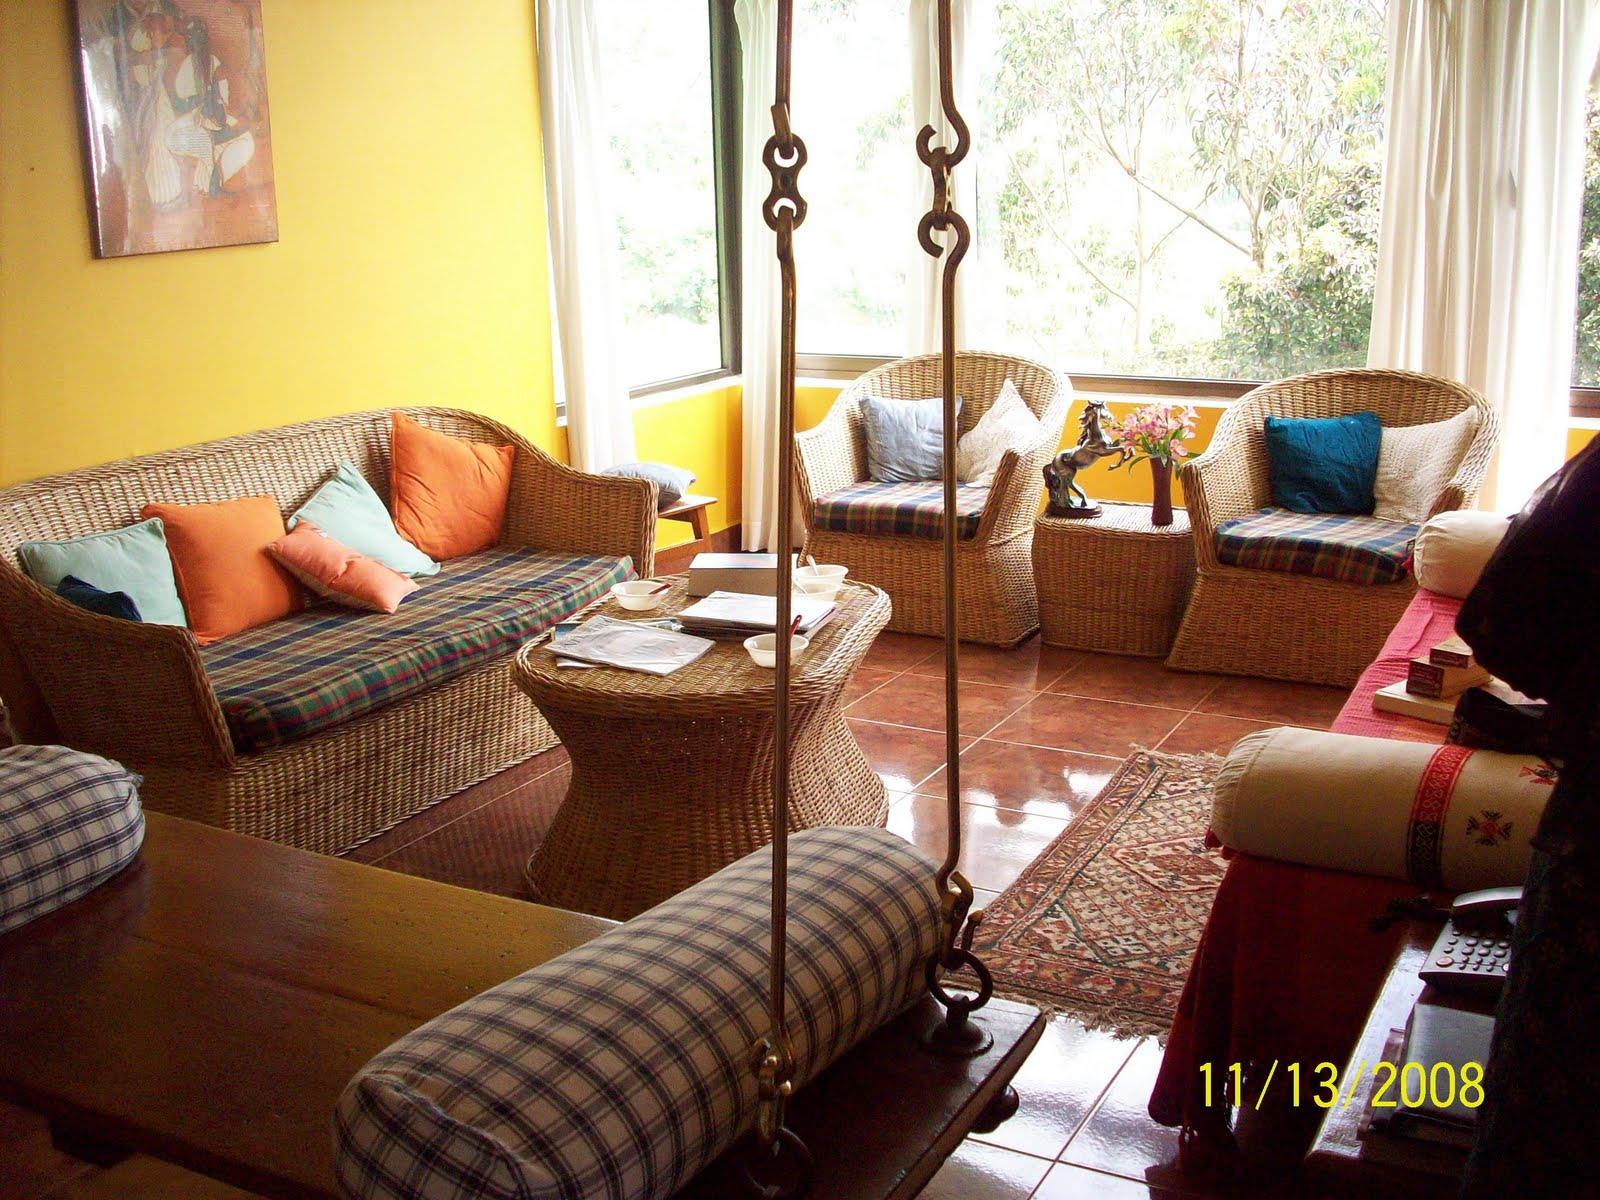 Mysore BLOG PARK: Swing in the living room